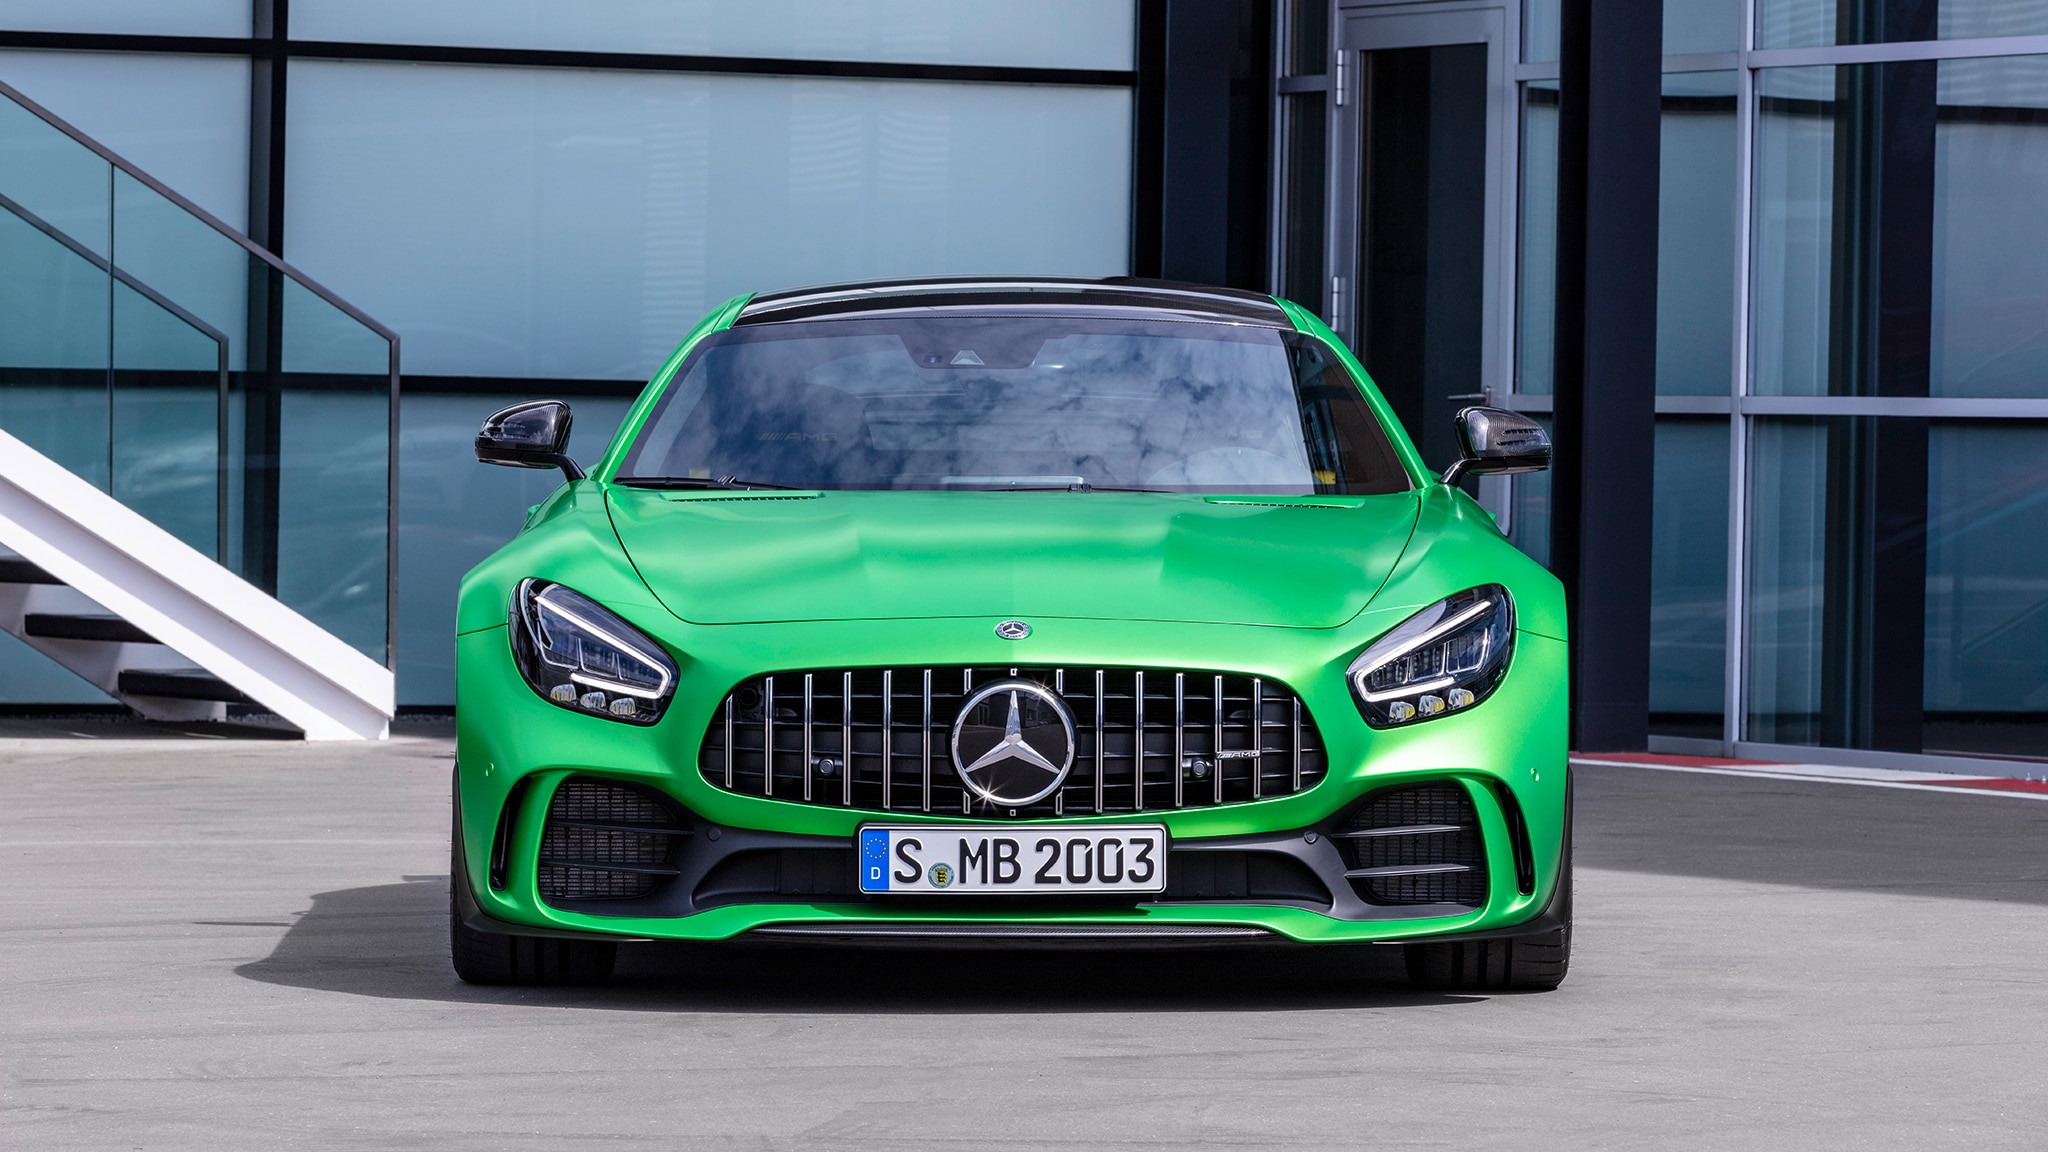 2020 Mercedes-AMG GT R Pro: No extra power, no extra need